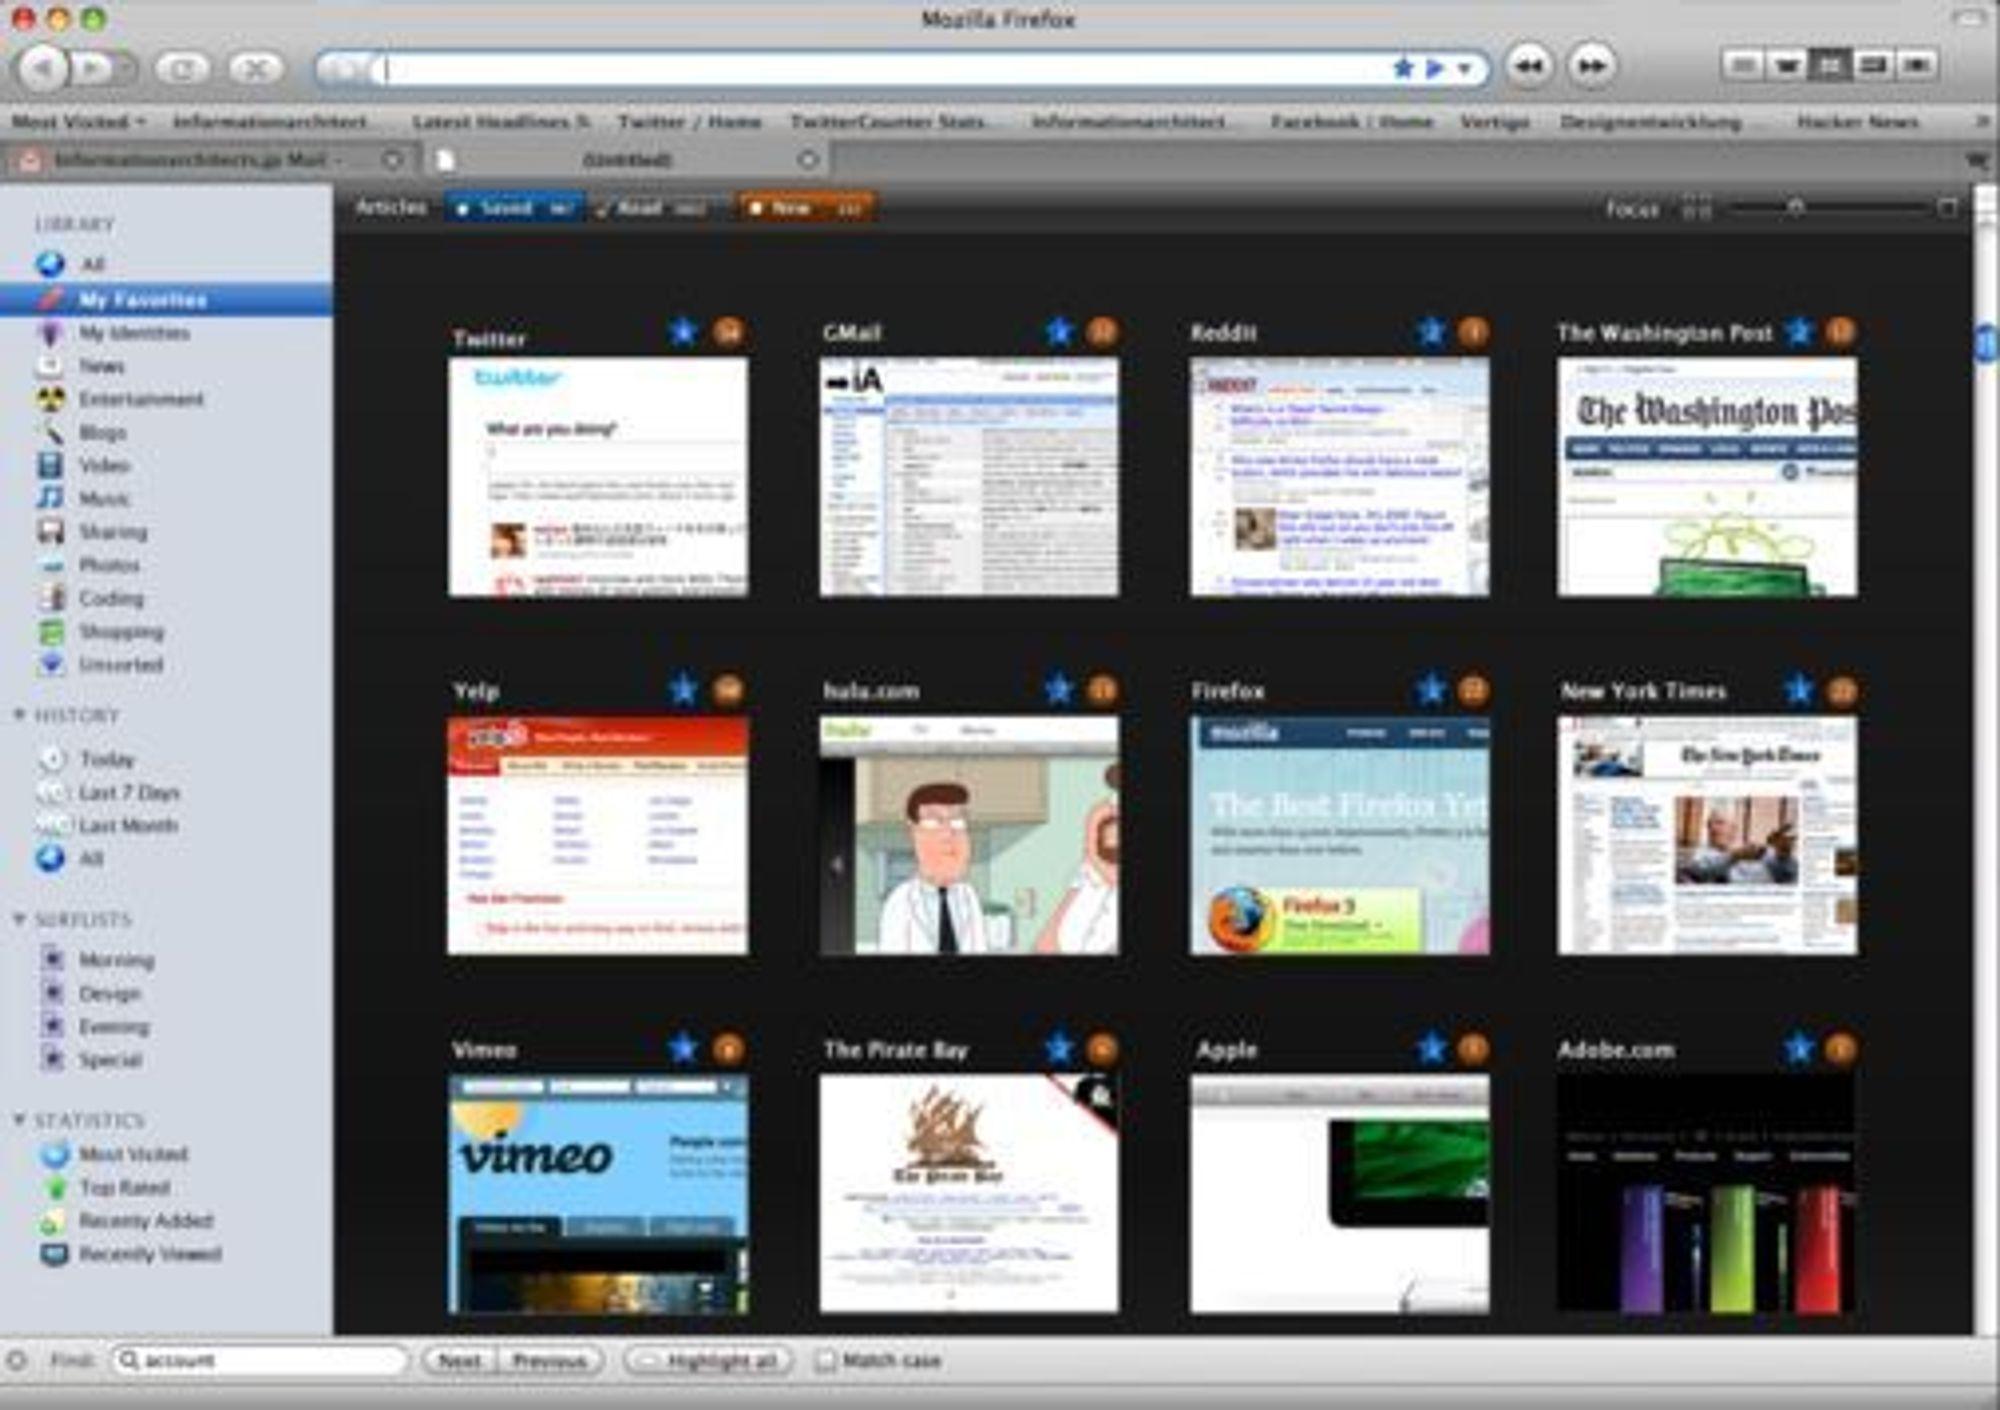 Firefox á la iTunes. Illustrasjon: Oliver Reichenstein